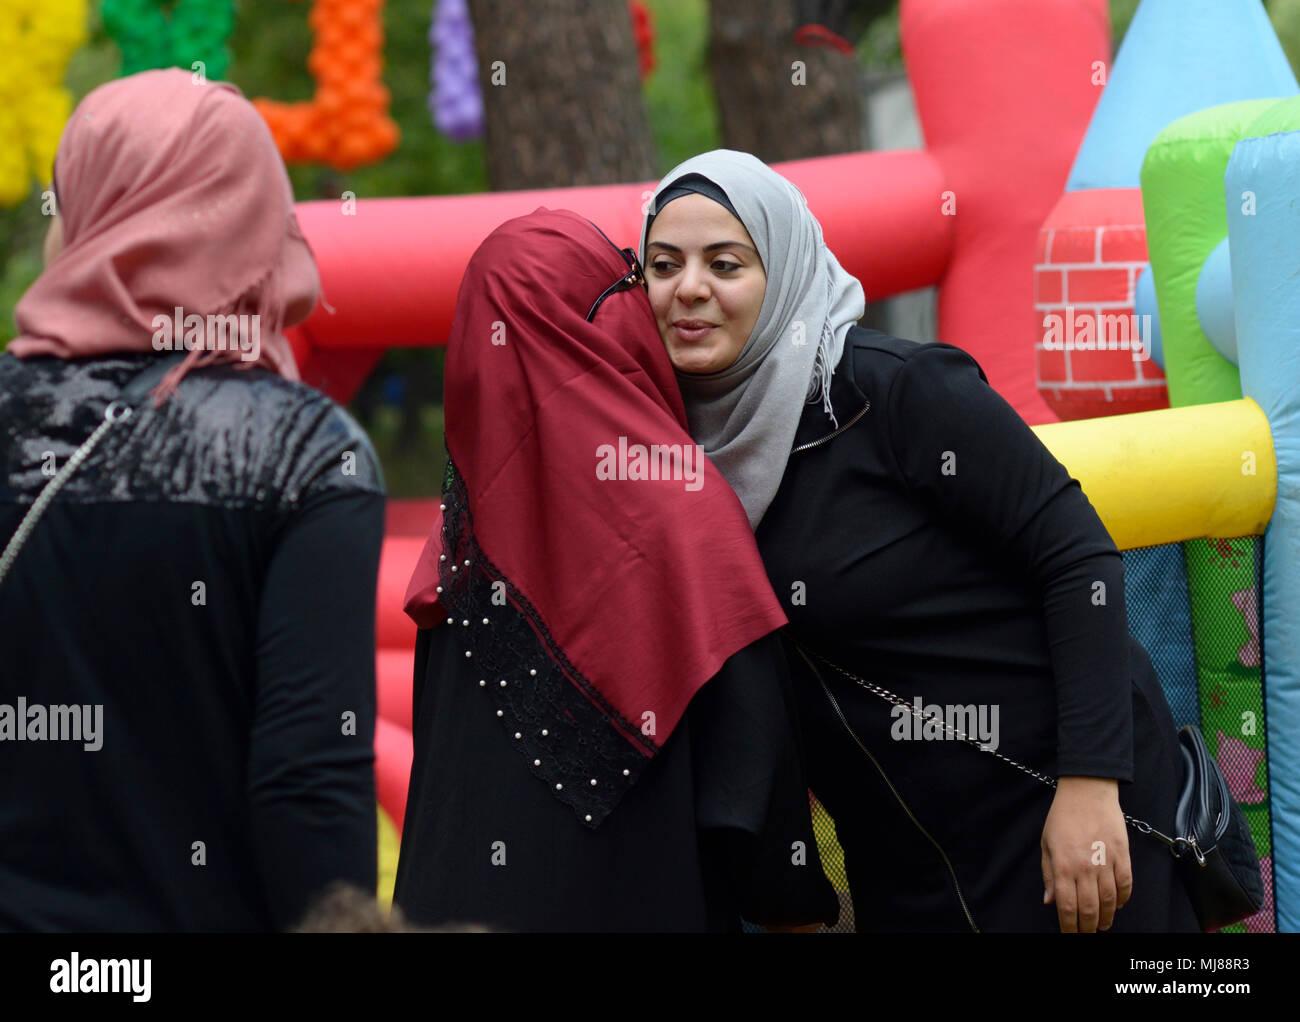 Muslim women in hijabs greeting each other during celebration of Hidirellez (festival of arrival of spring).Kiev, Ukraine - Stock Image